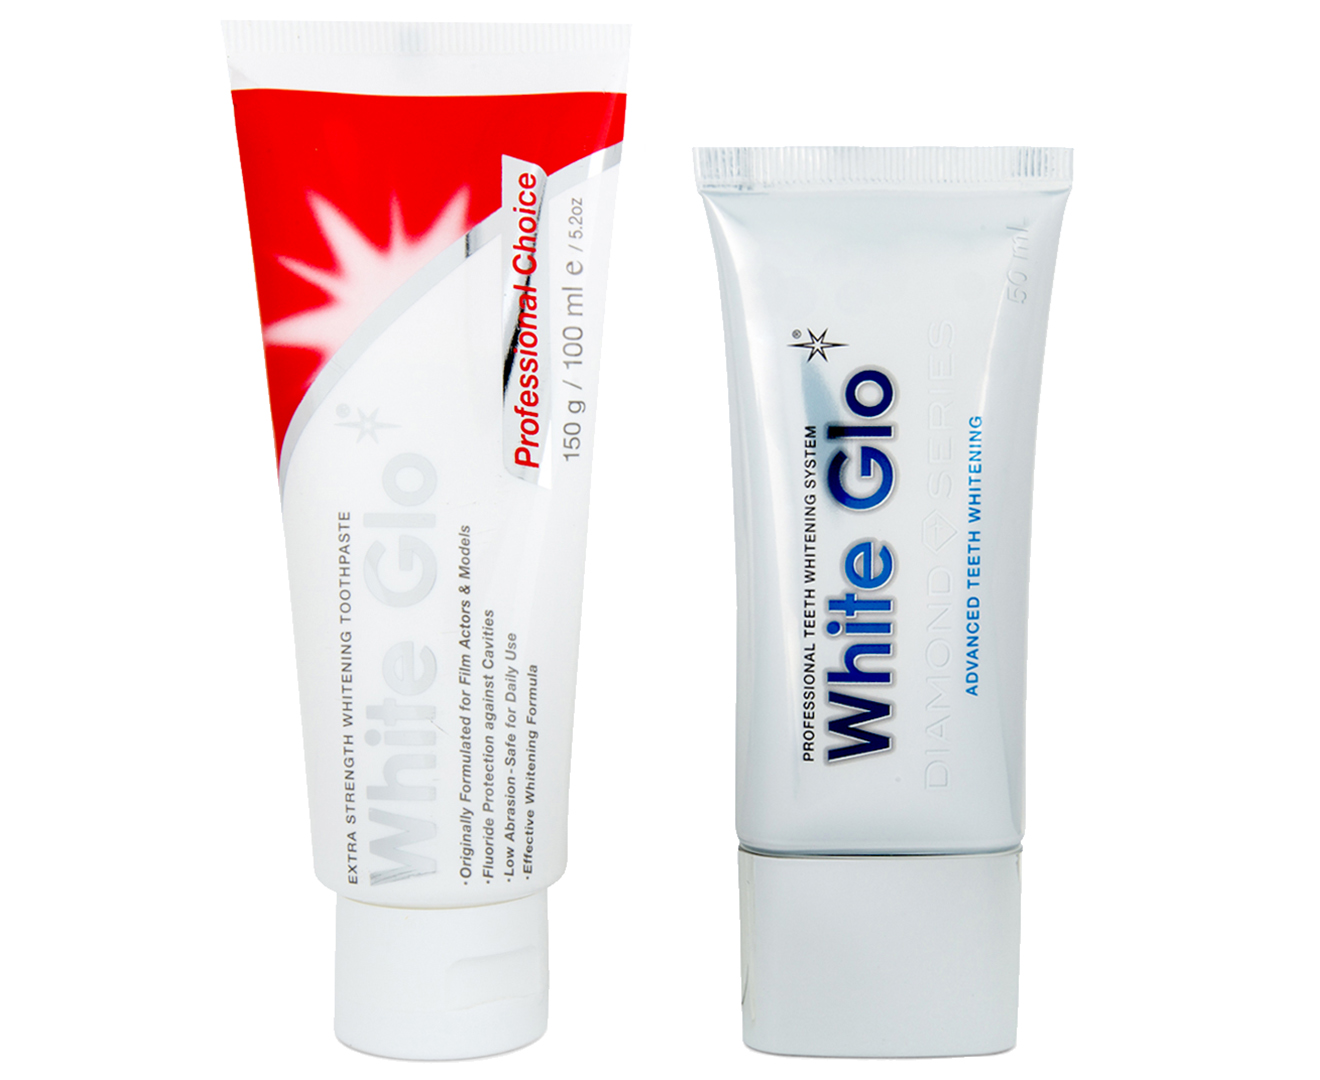 White Glo Diamond Whitening System Kit